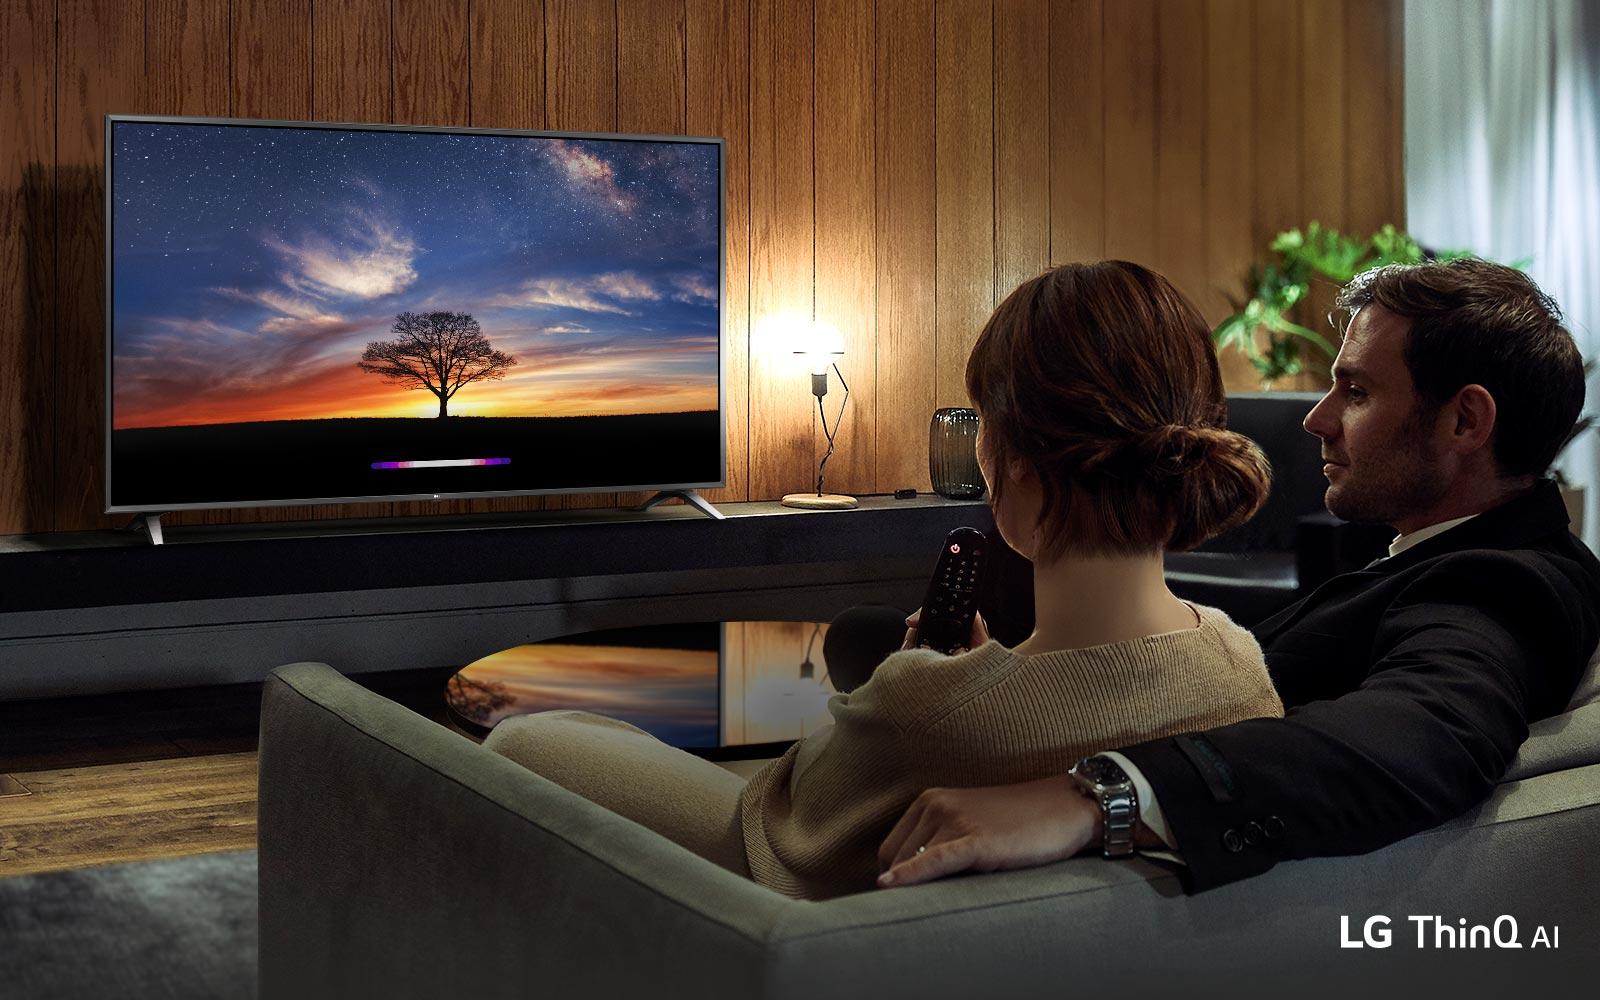 TV-UHD-50-UM76-01-AI-ThinQ-Desktop